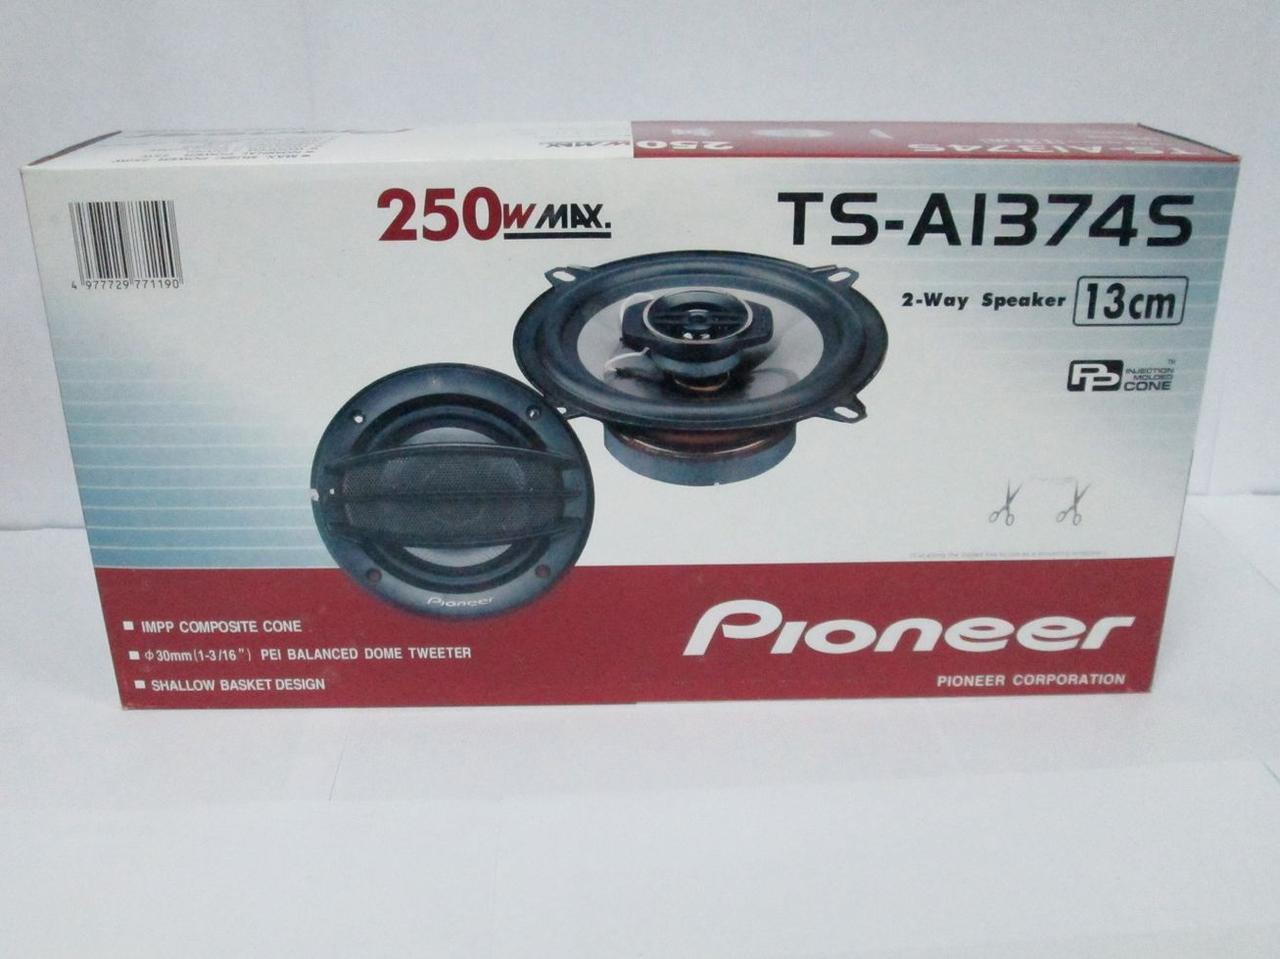 Динамики Pioneer TS-A 1374S  (250 Вт) 13 см